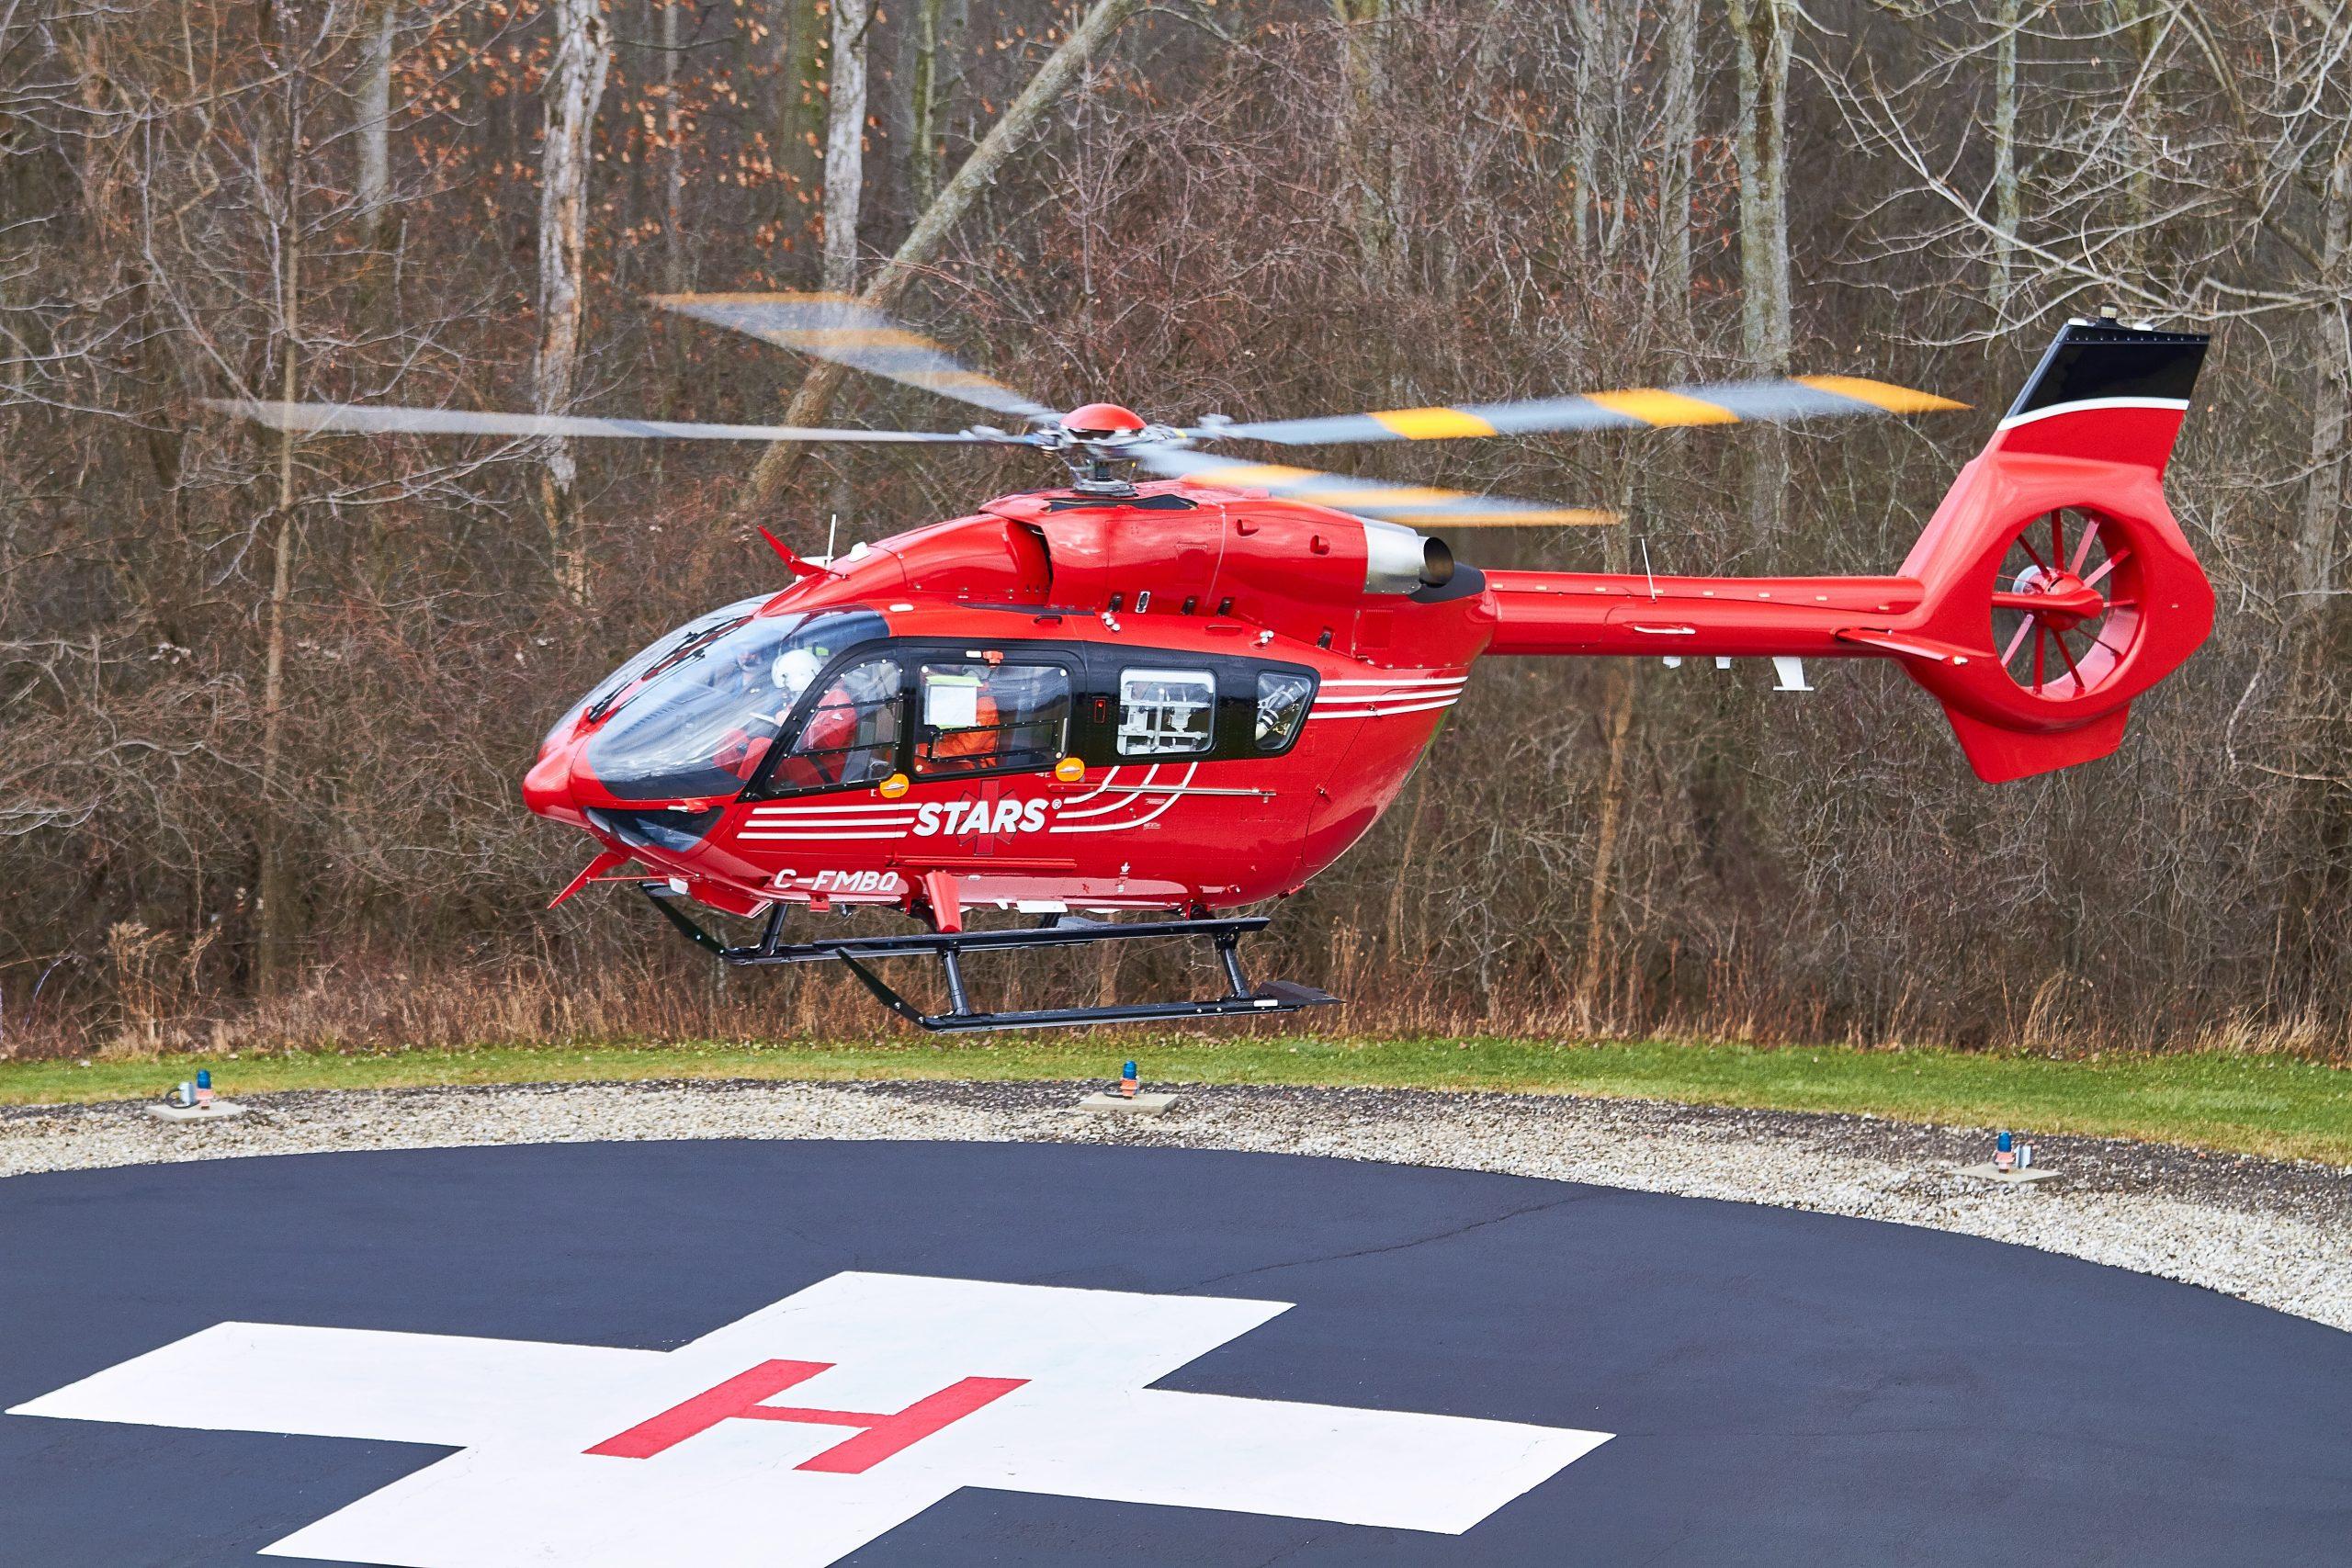 STARS welcomes H145 to Winnipeg base